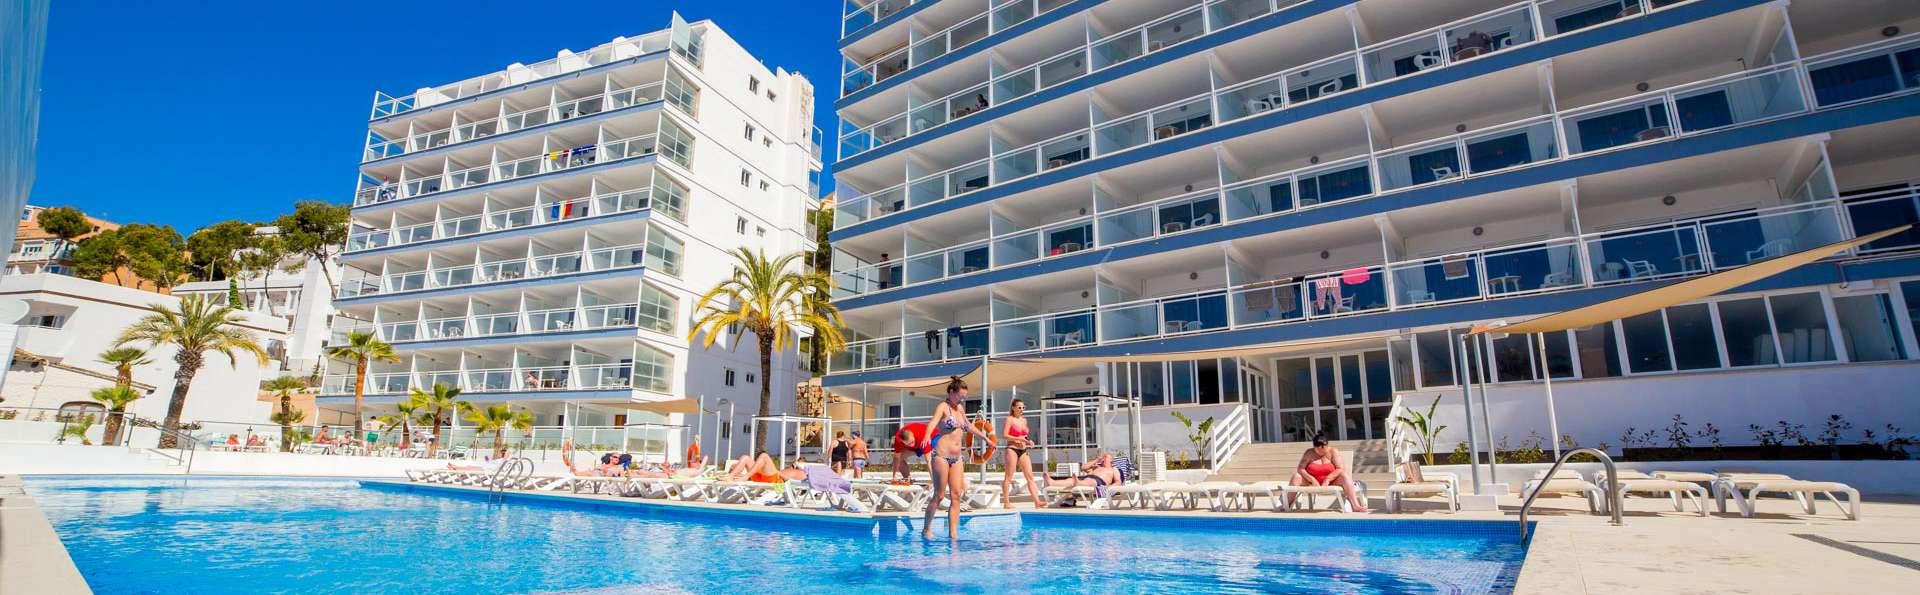 Pierre & Vacances Mallorca Deya - EDIT_POOL_04.jpg